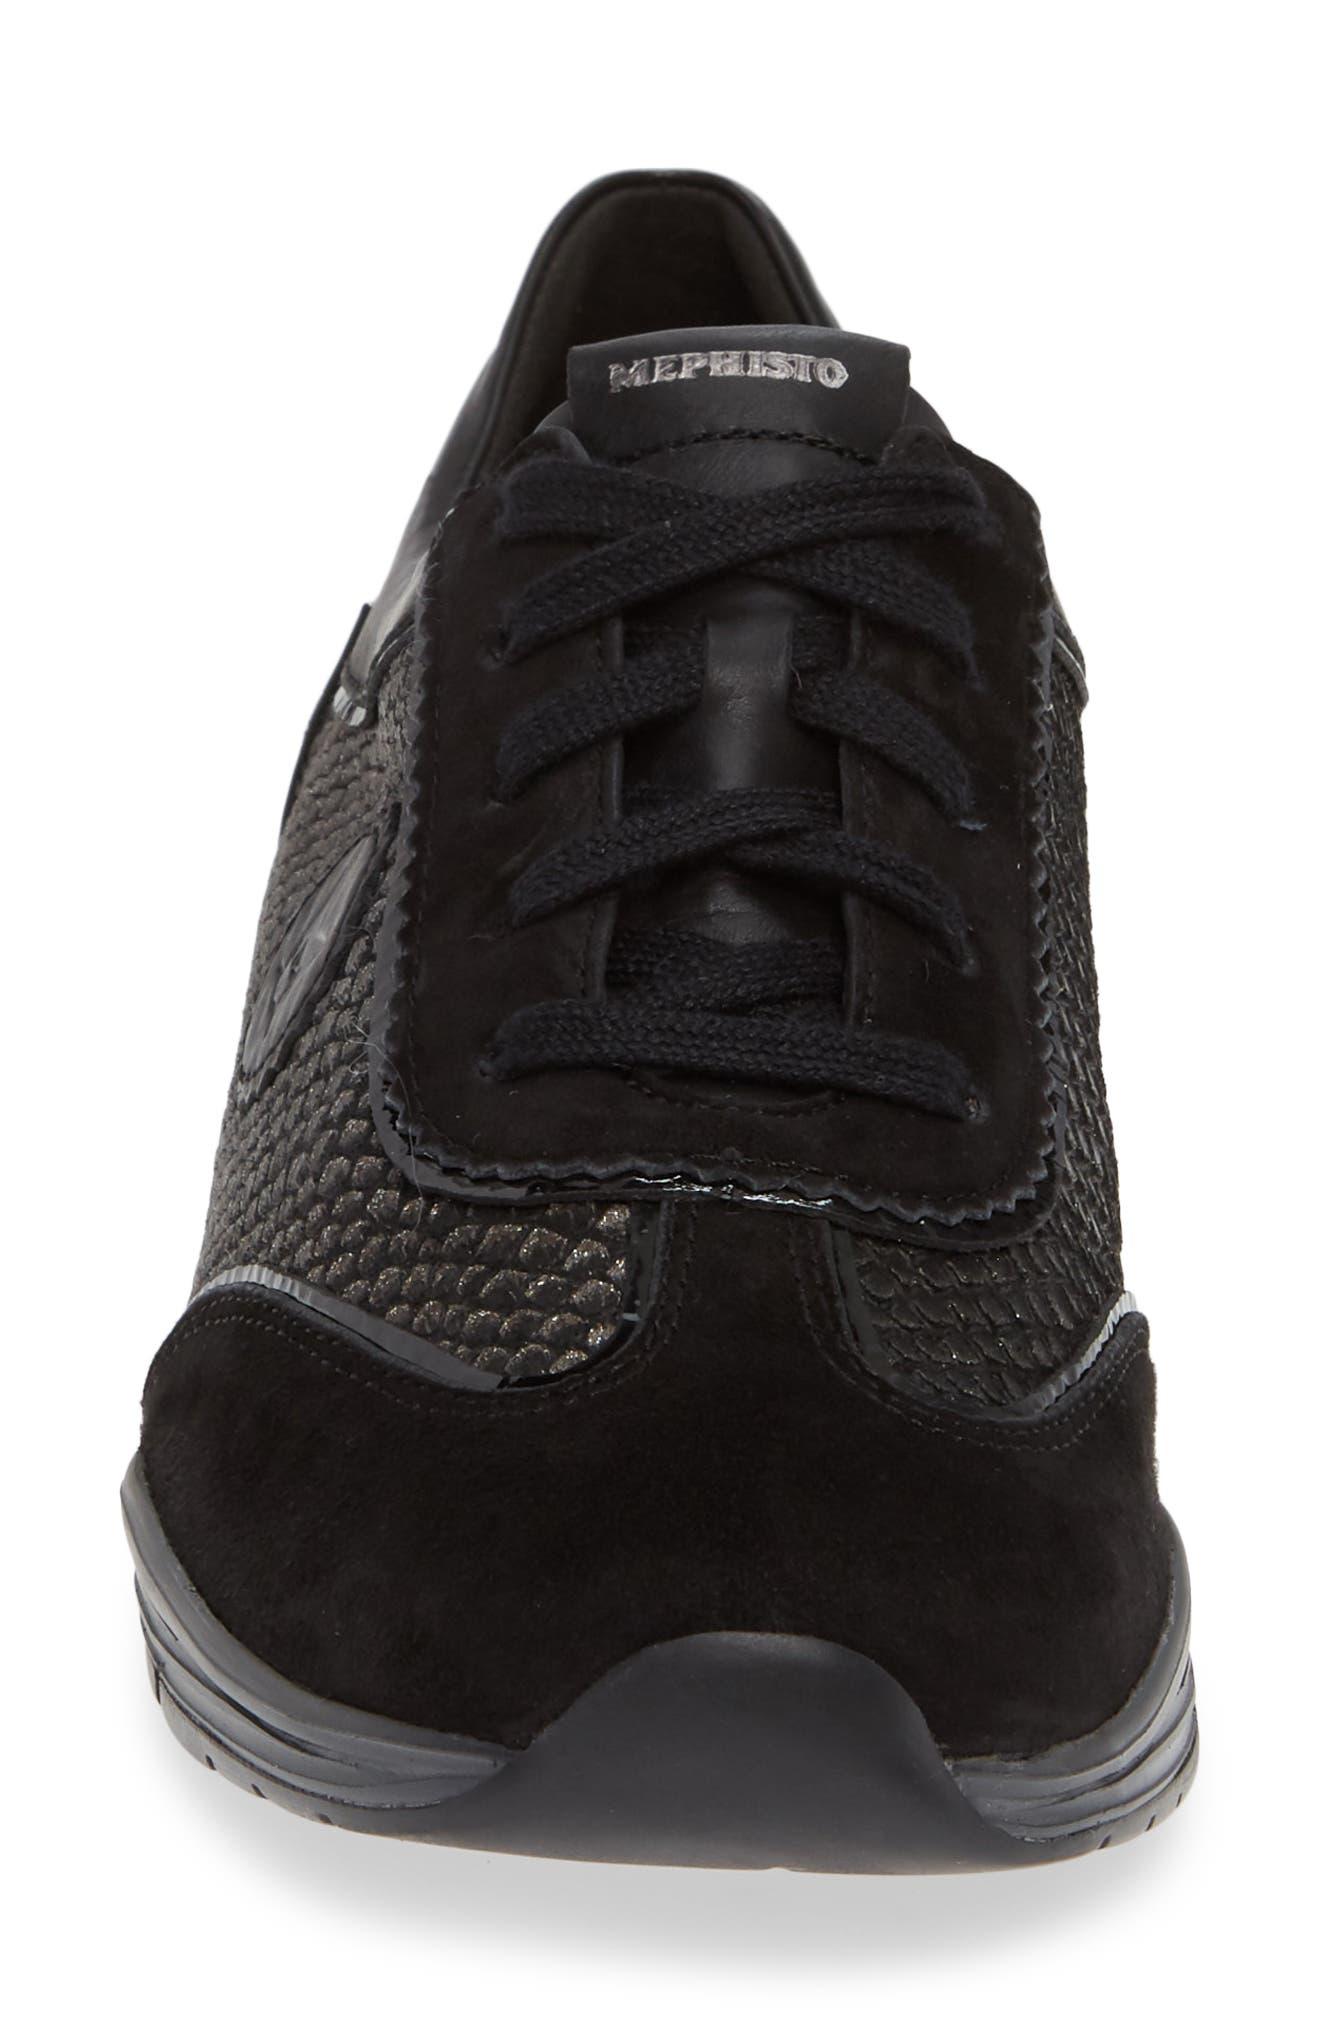 MEPHISTO, 'Yael' Soft-Air Sneaker, Alternate thumbnail 4, color, BLACK SUEDE